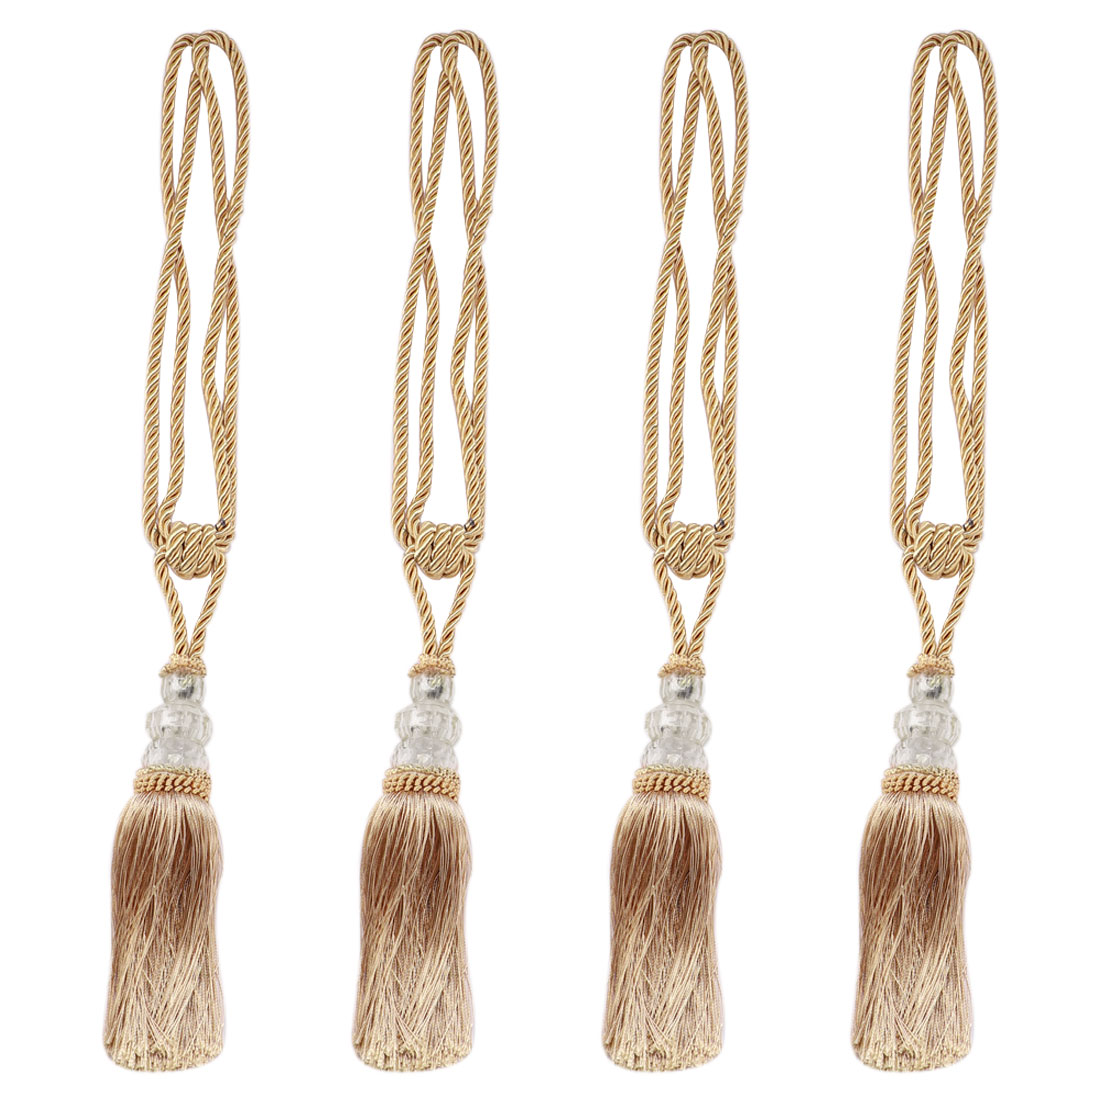 Curtain Tiebacks Holdbacks w Hooks Curtain Rope Holder 4 Set Bronze Tone + Beige